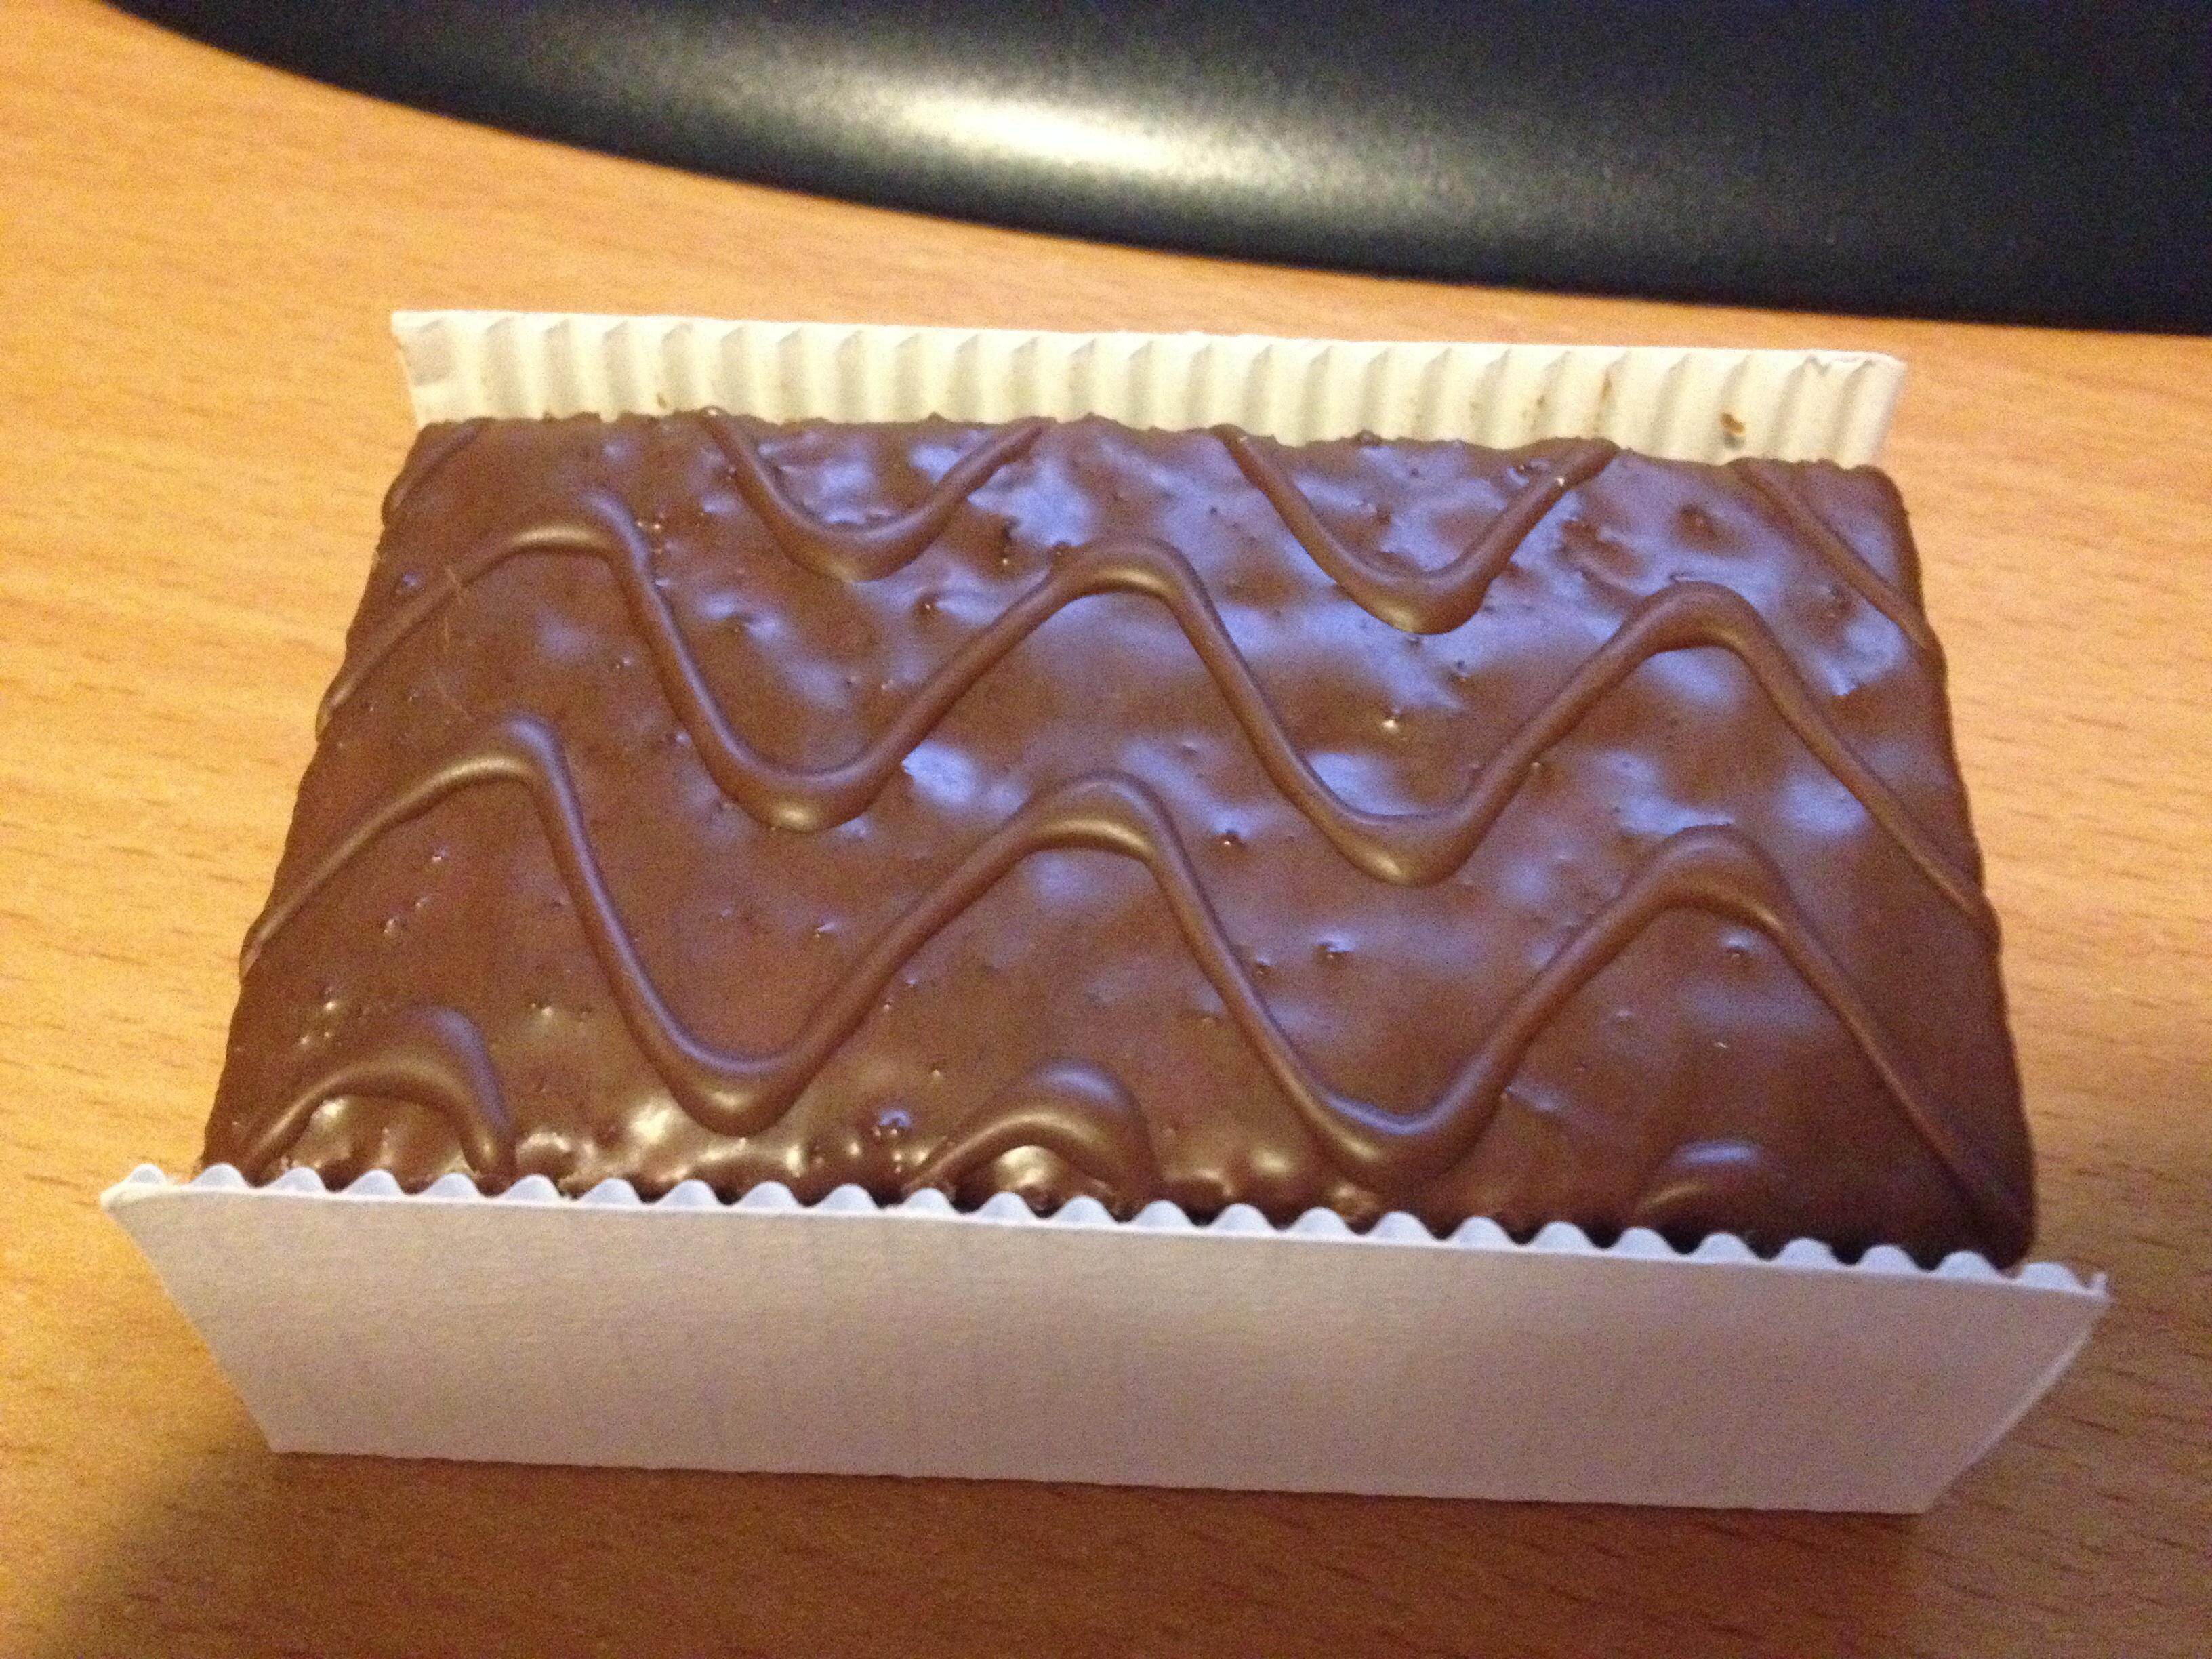 https://foodloader.net/BrollyLSSJ_2014-05-05_Balconi_Mix_-_Chocolate.jpg